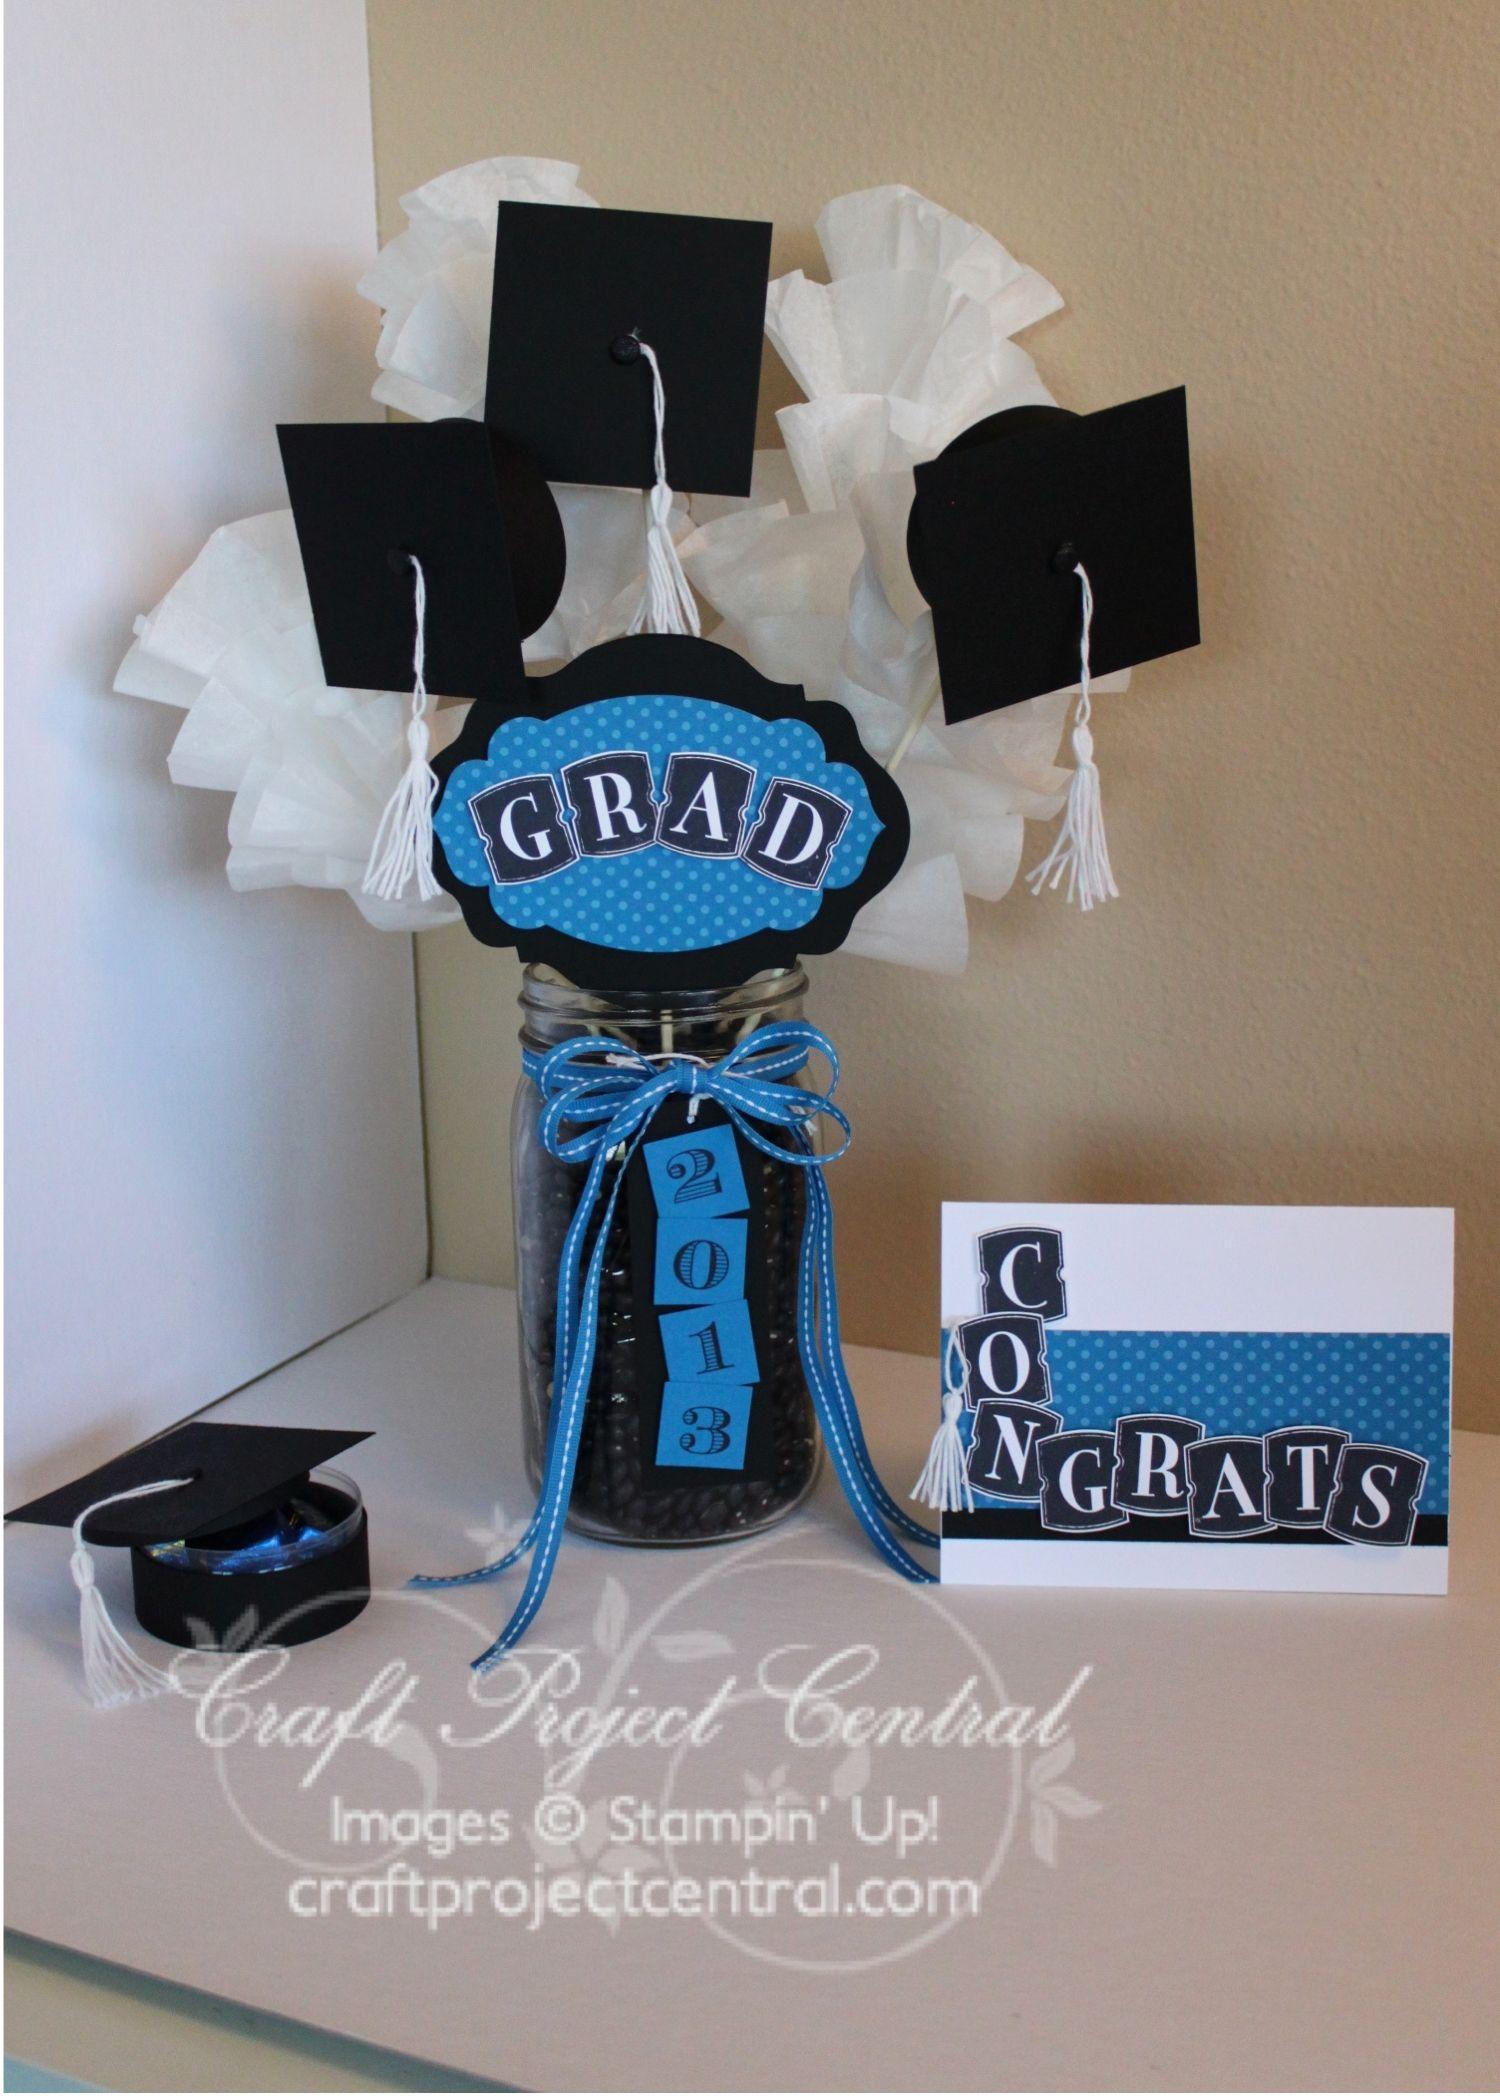 Graduation Decorations Craftprojectcentralcom Blog Archive Hats Off Graduation Decor